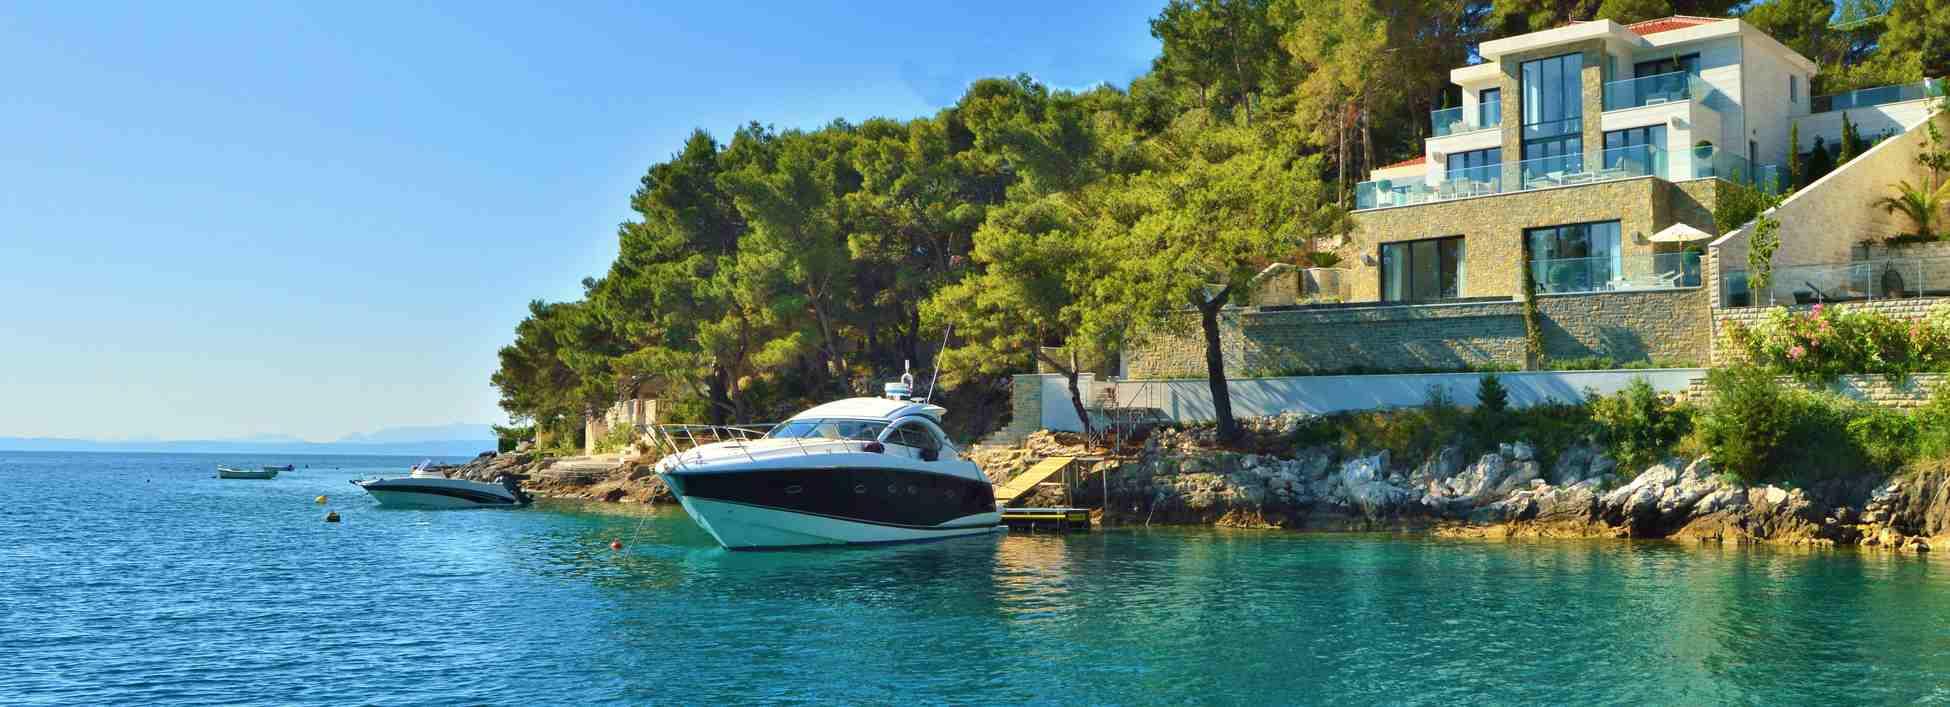 croatian villas rent